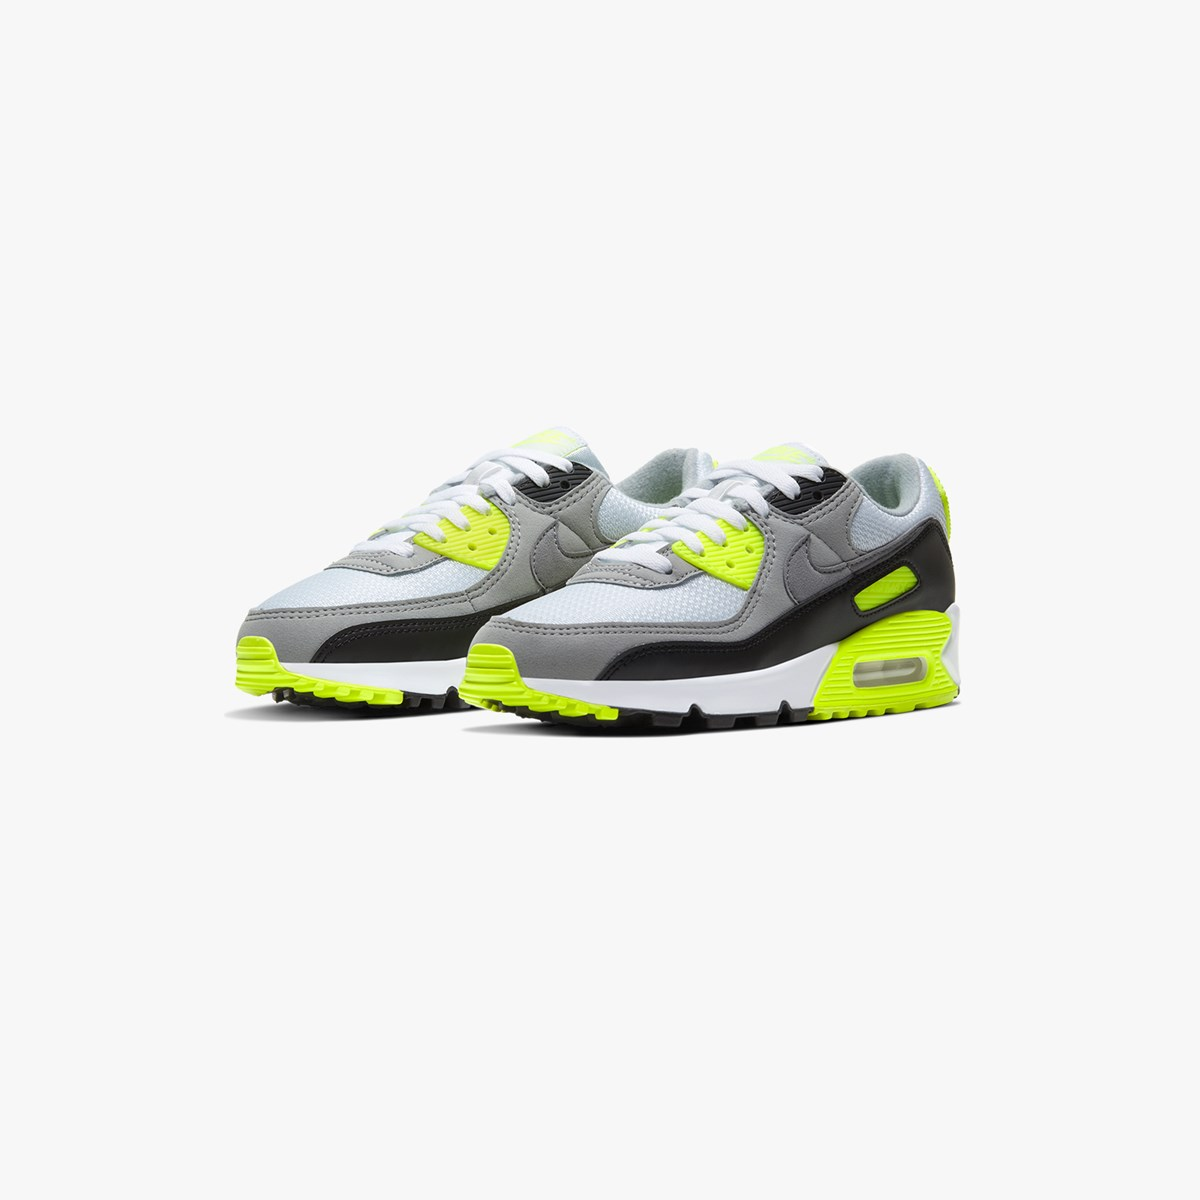 Nike Wmns Air Max 90 Cd0490 101 Sneakersnstuff I Sneakers & Streetwear online seit 1999